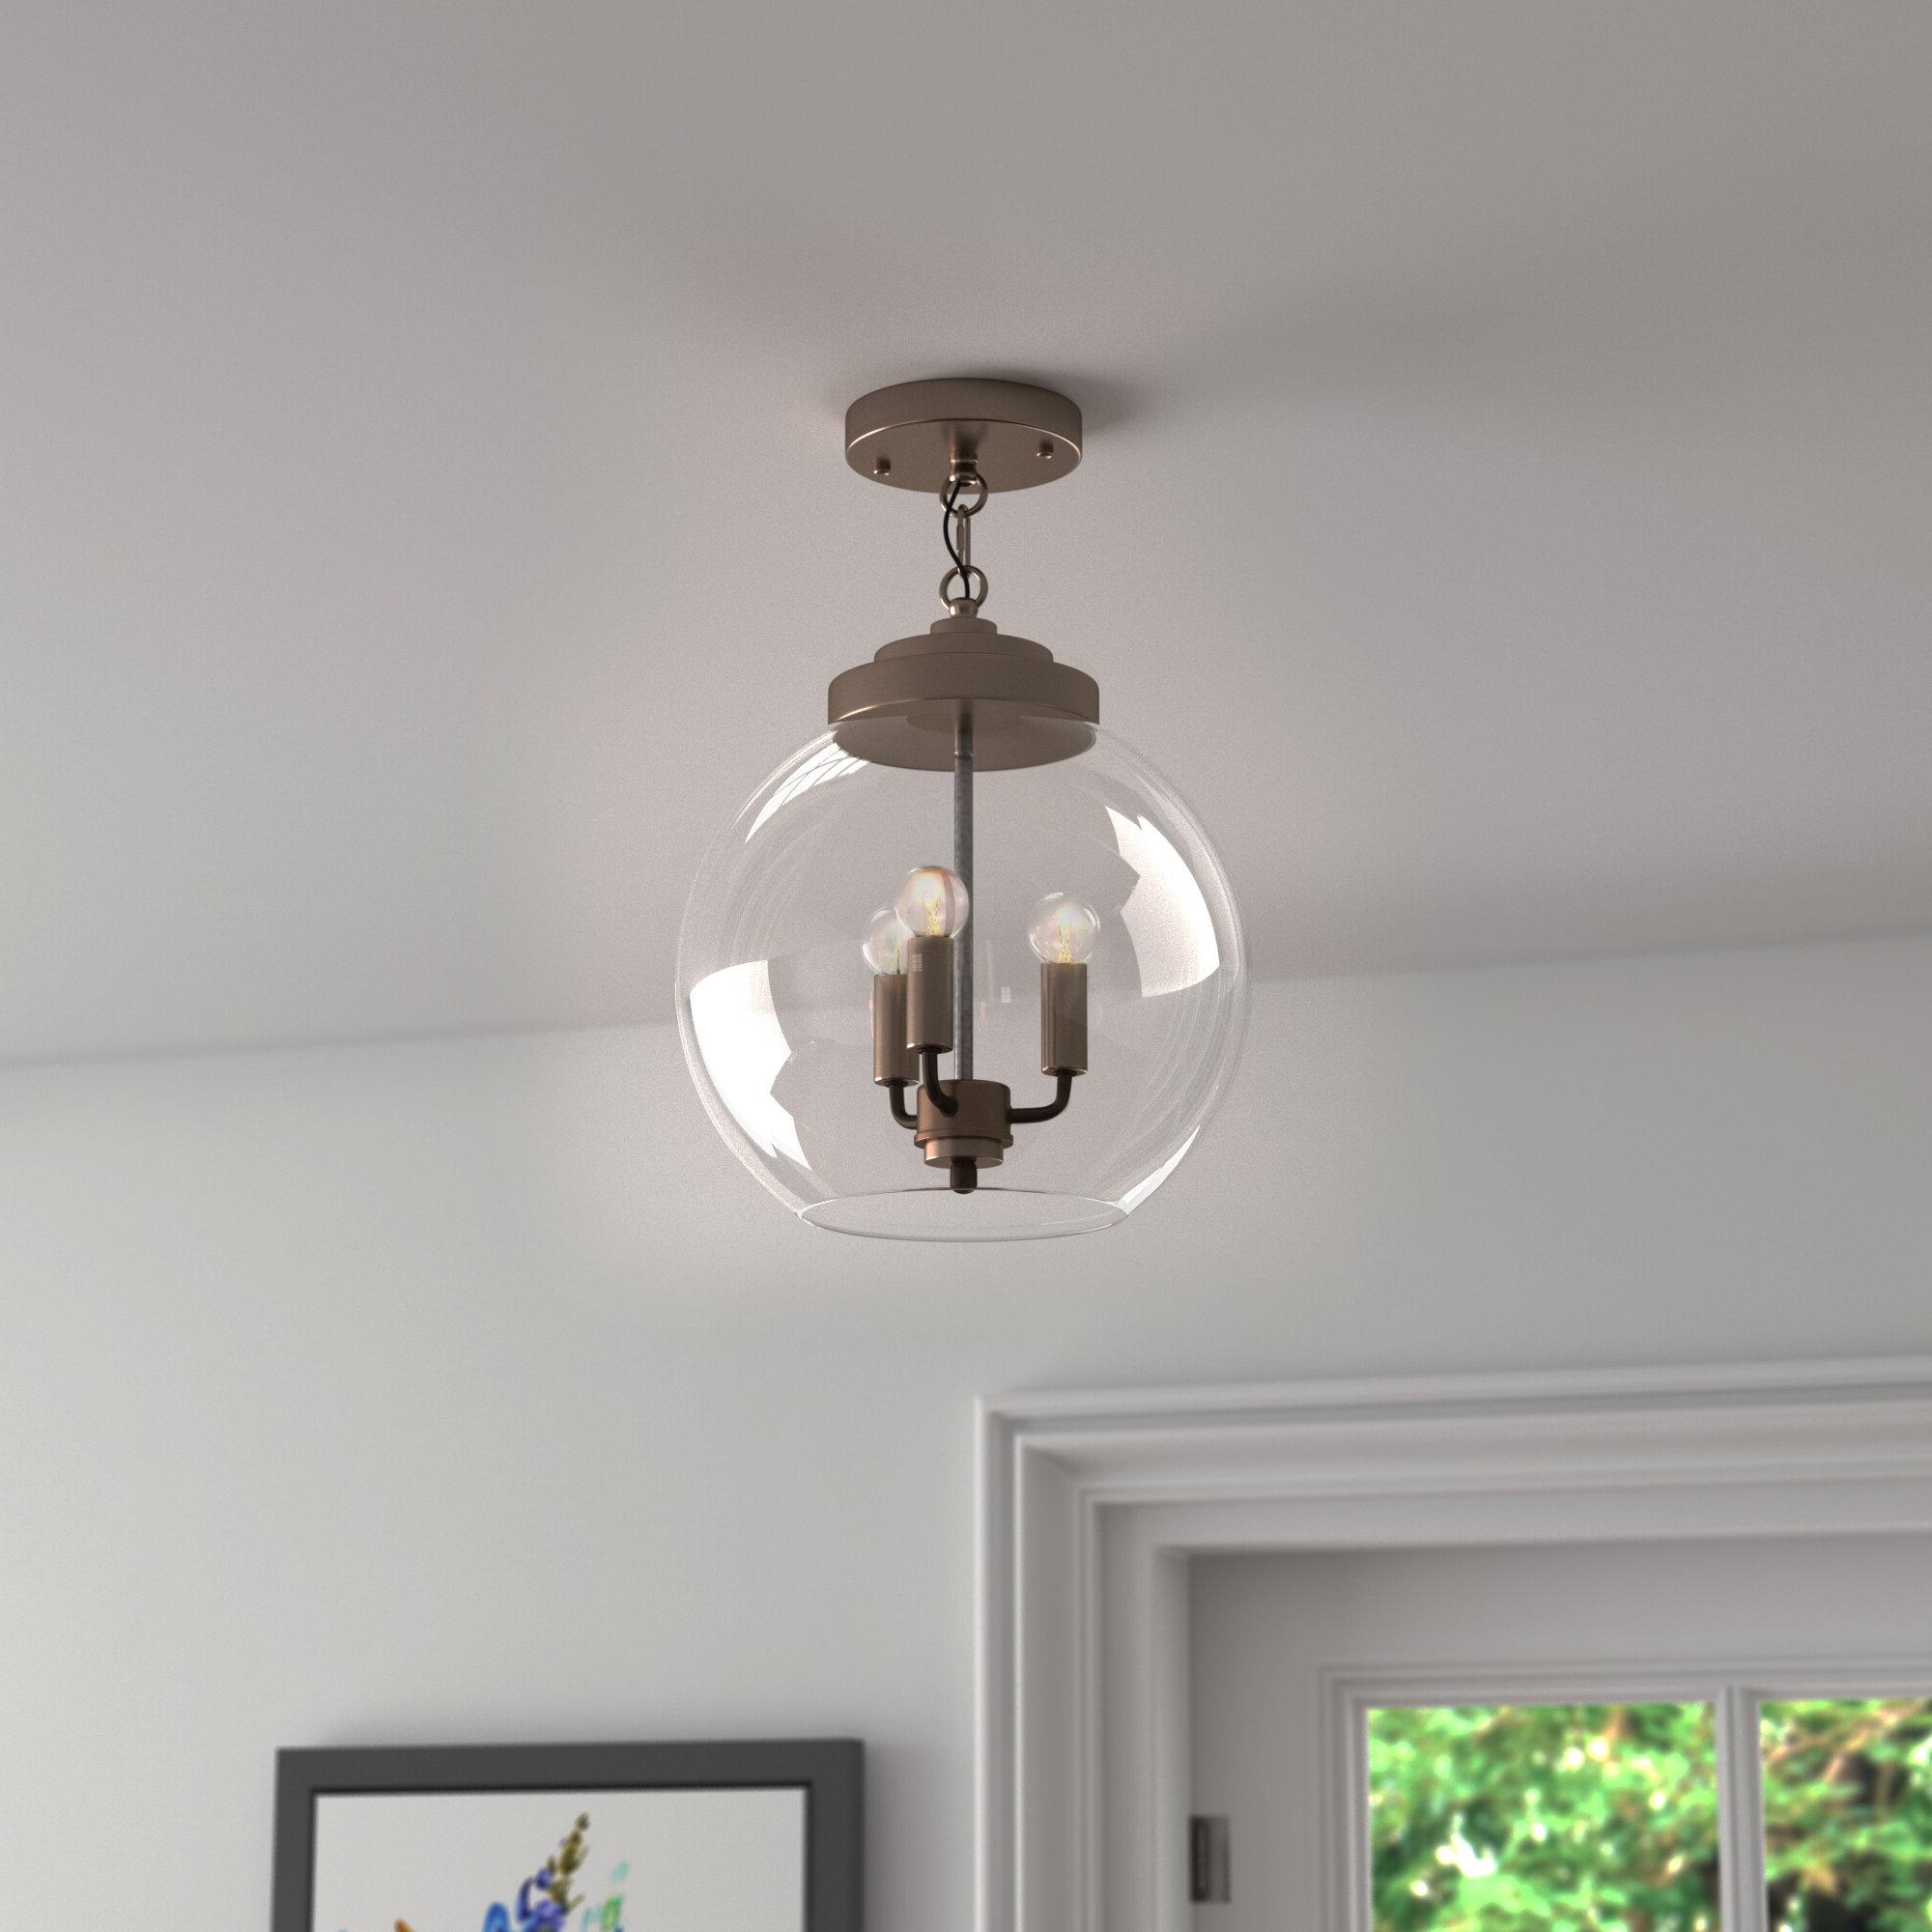 Isoline 2 Light Lantern Geometric Pendants For Latest Everly Quinn Isoline 2 Light Lantern Geometric Pendant (Gallery 7 of 20)